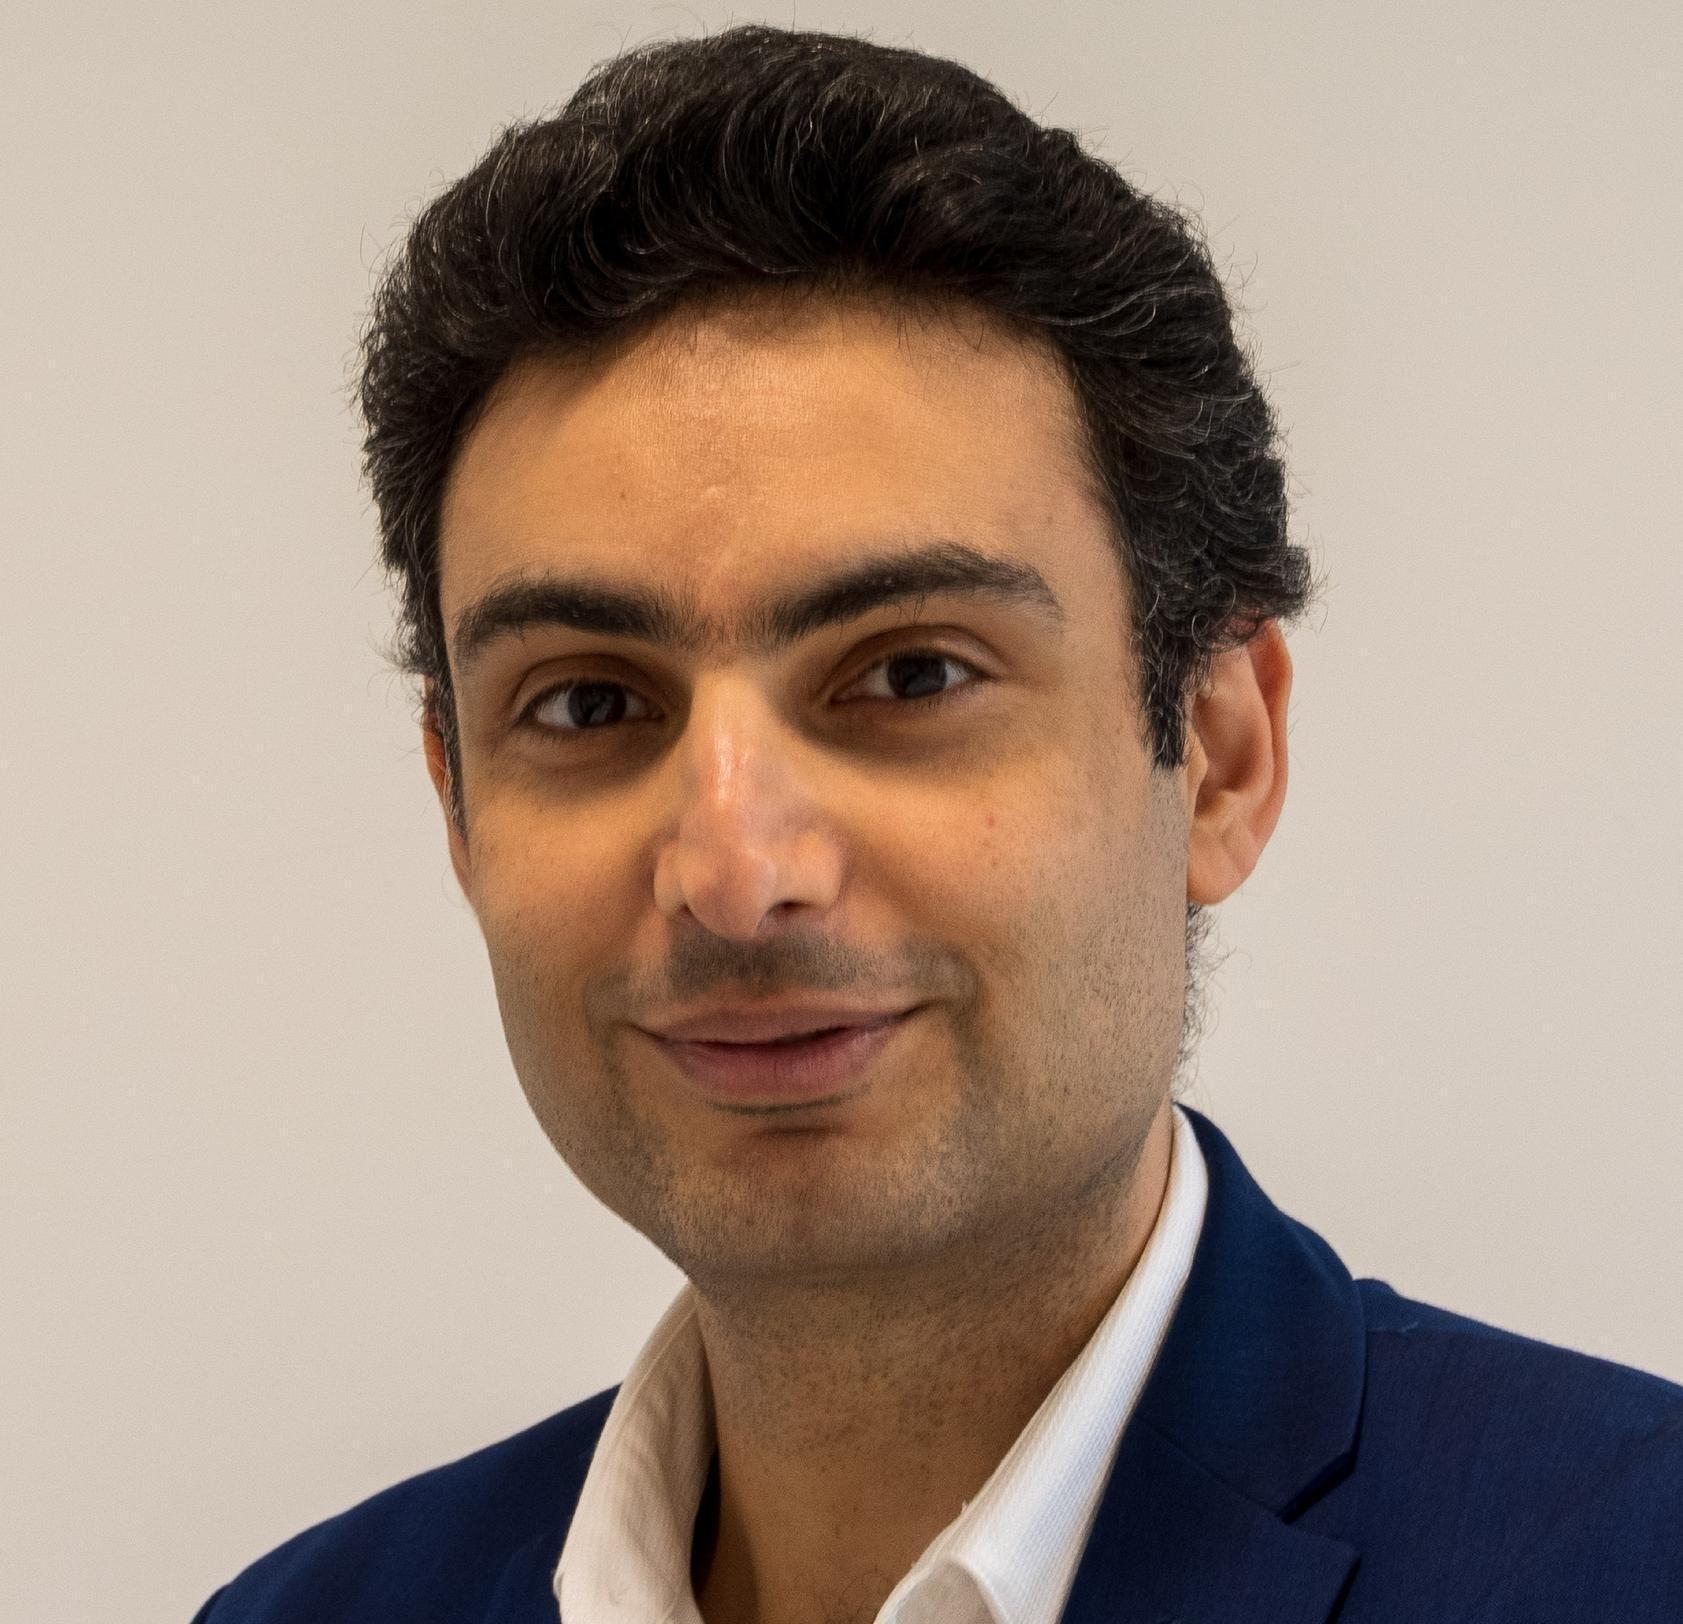 Samer Ali